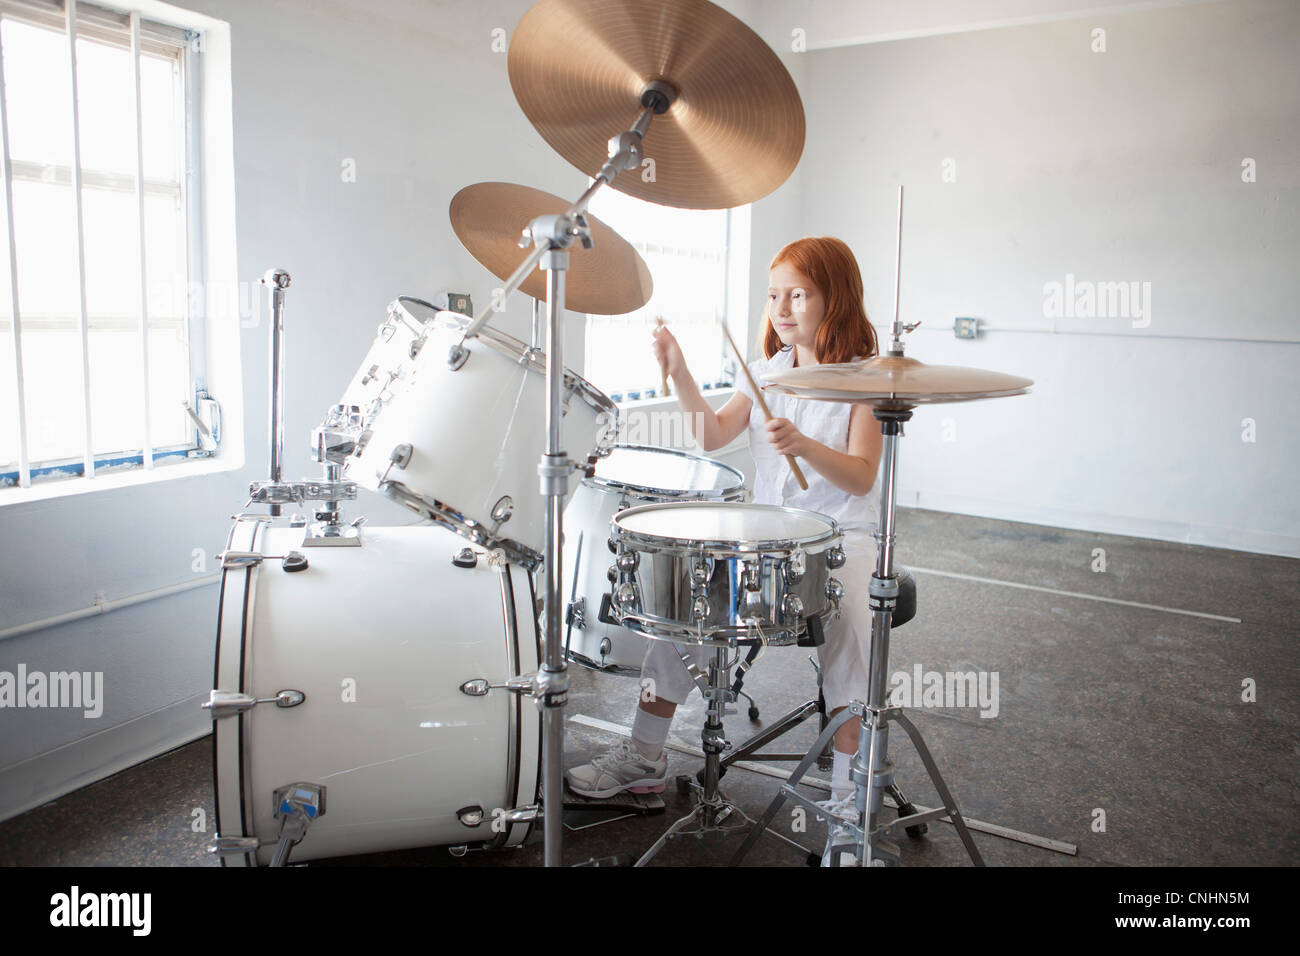 Girl plays drum kit - Stock Image